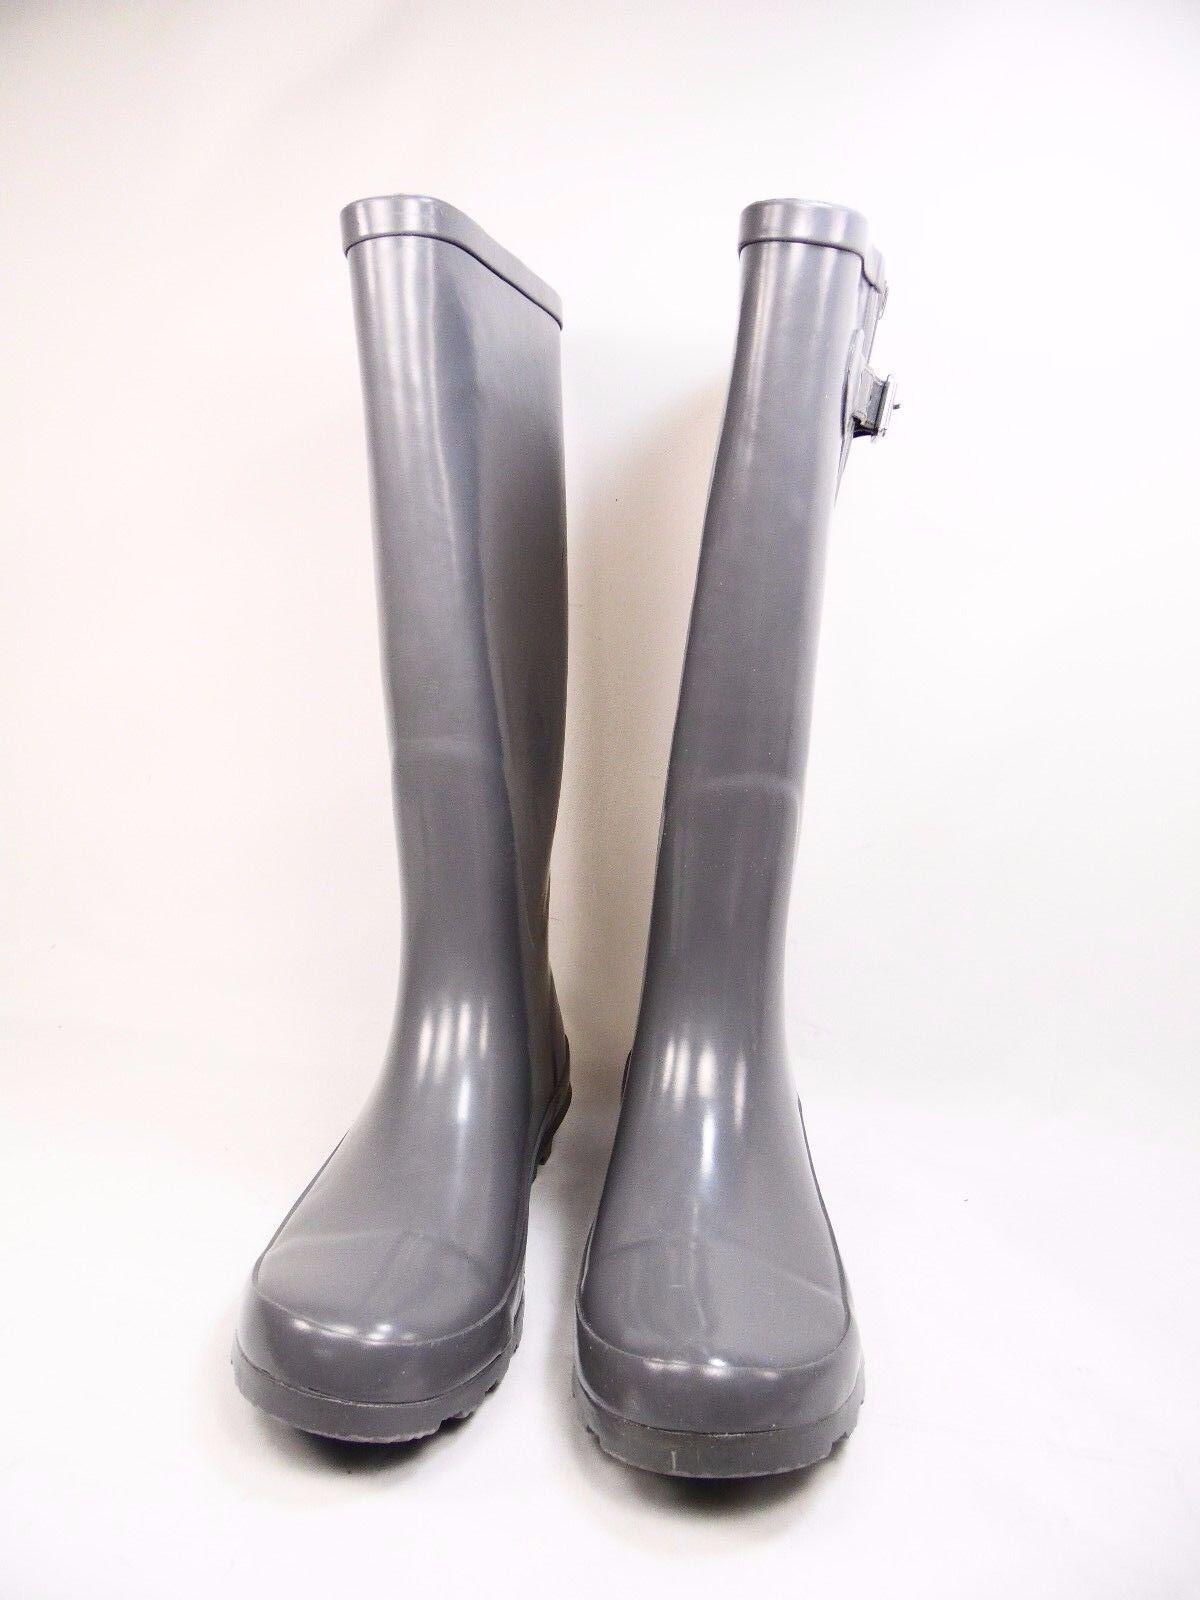 Western Chief Women's Grey Classic Tall Rain Boots Grey Women's Size 7 b21f7d